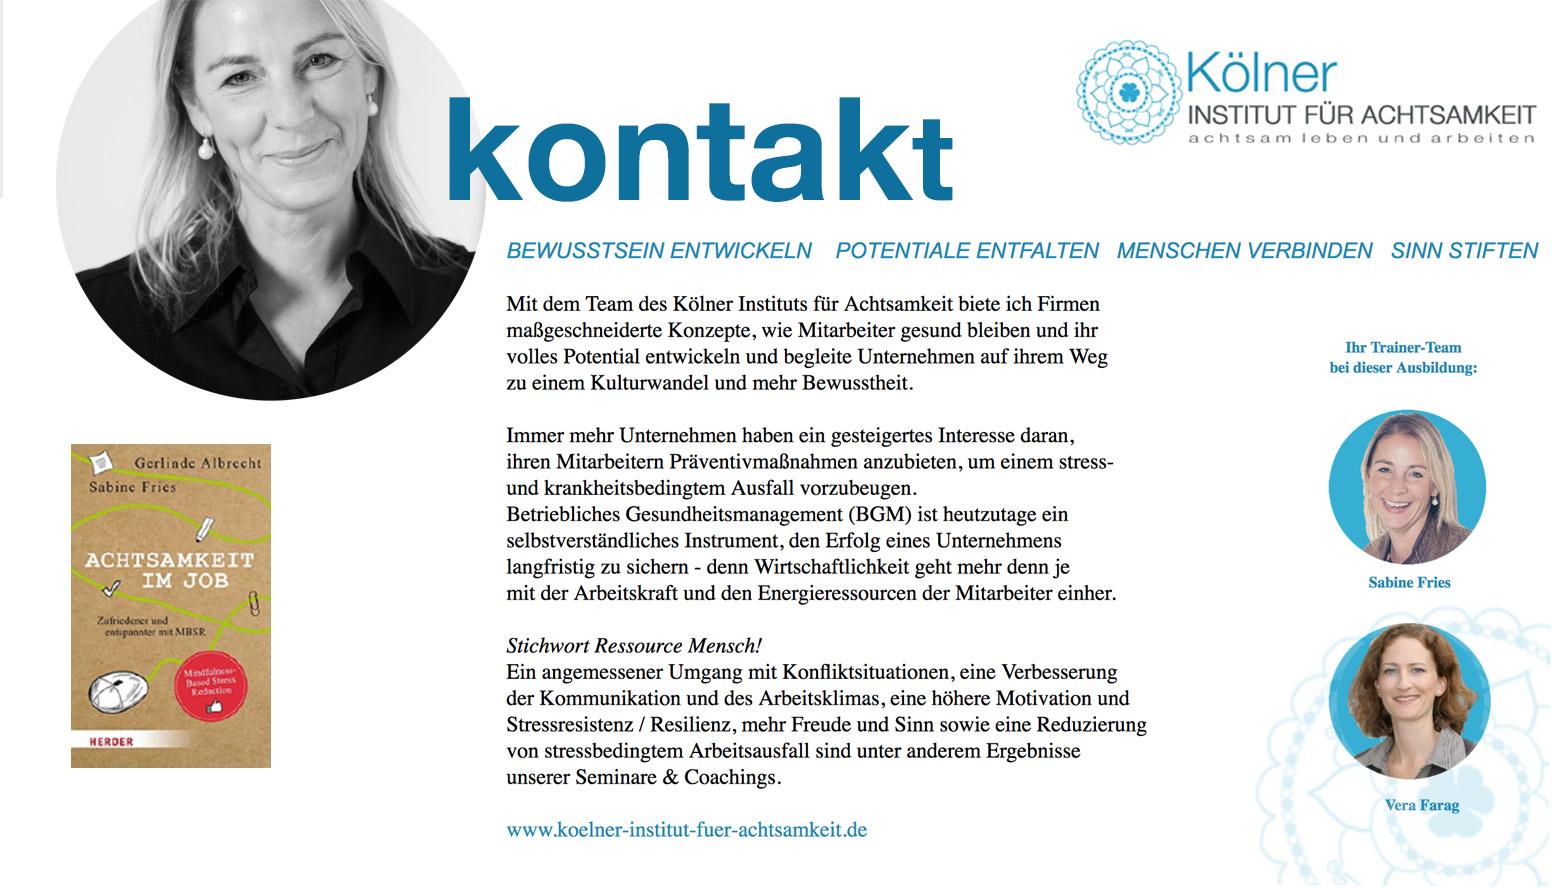 MINDFULNESS BOTSCHAFTER -KONTAKT